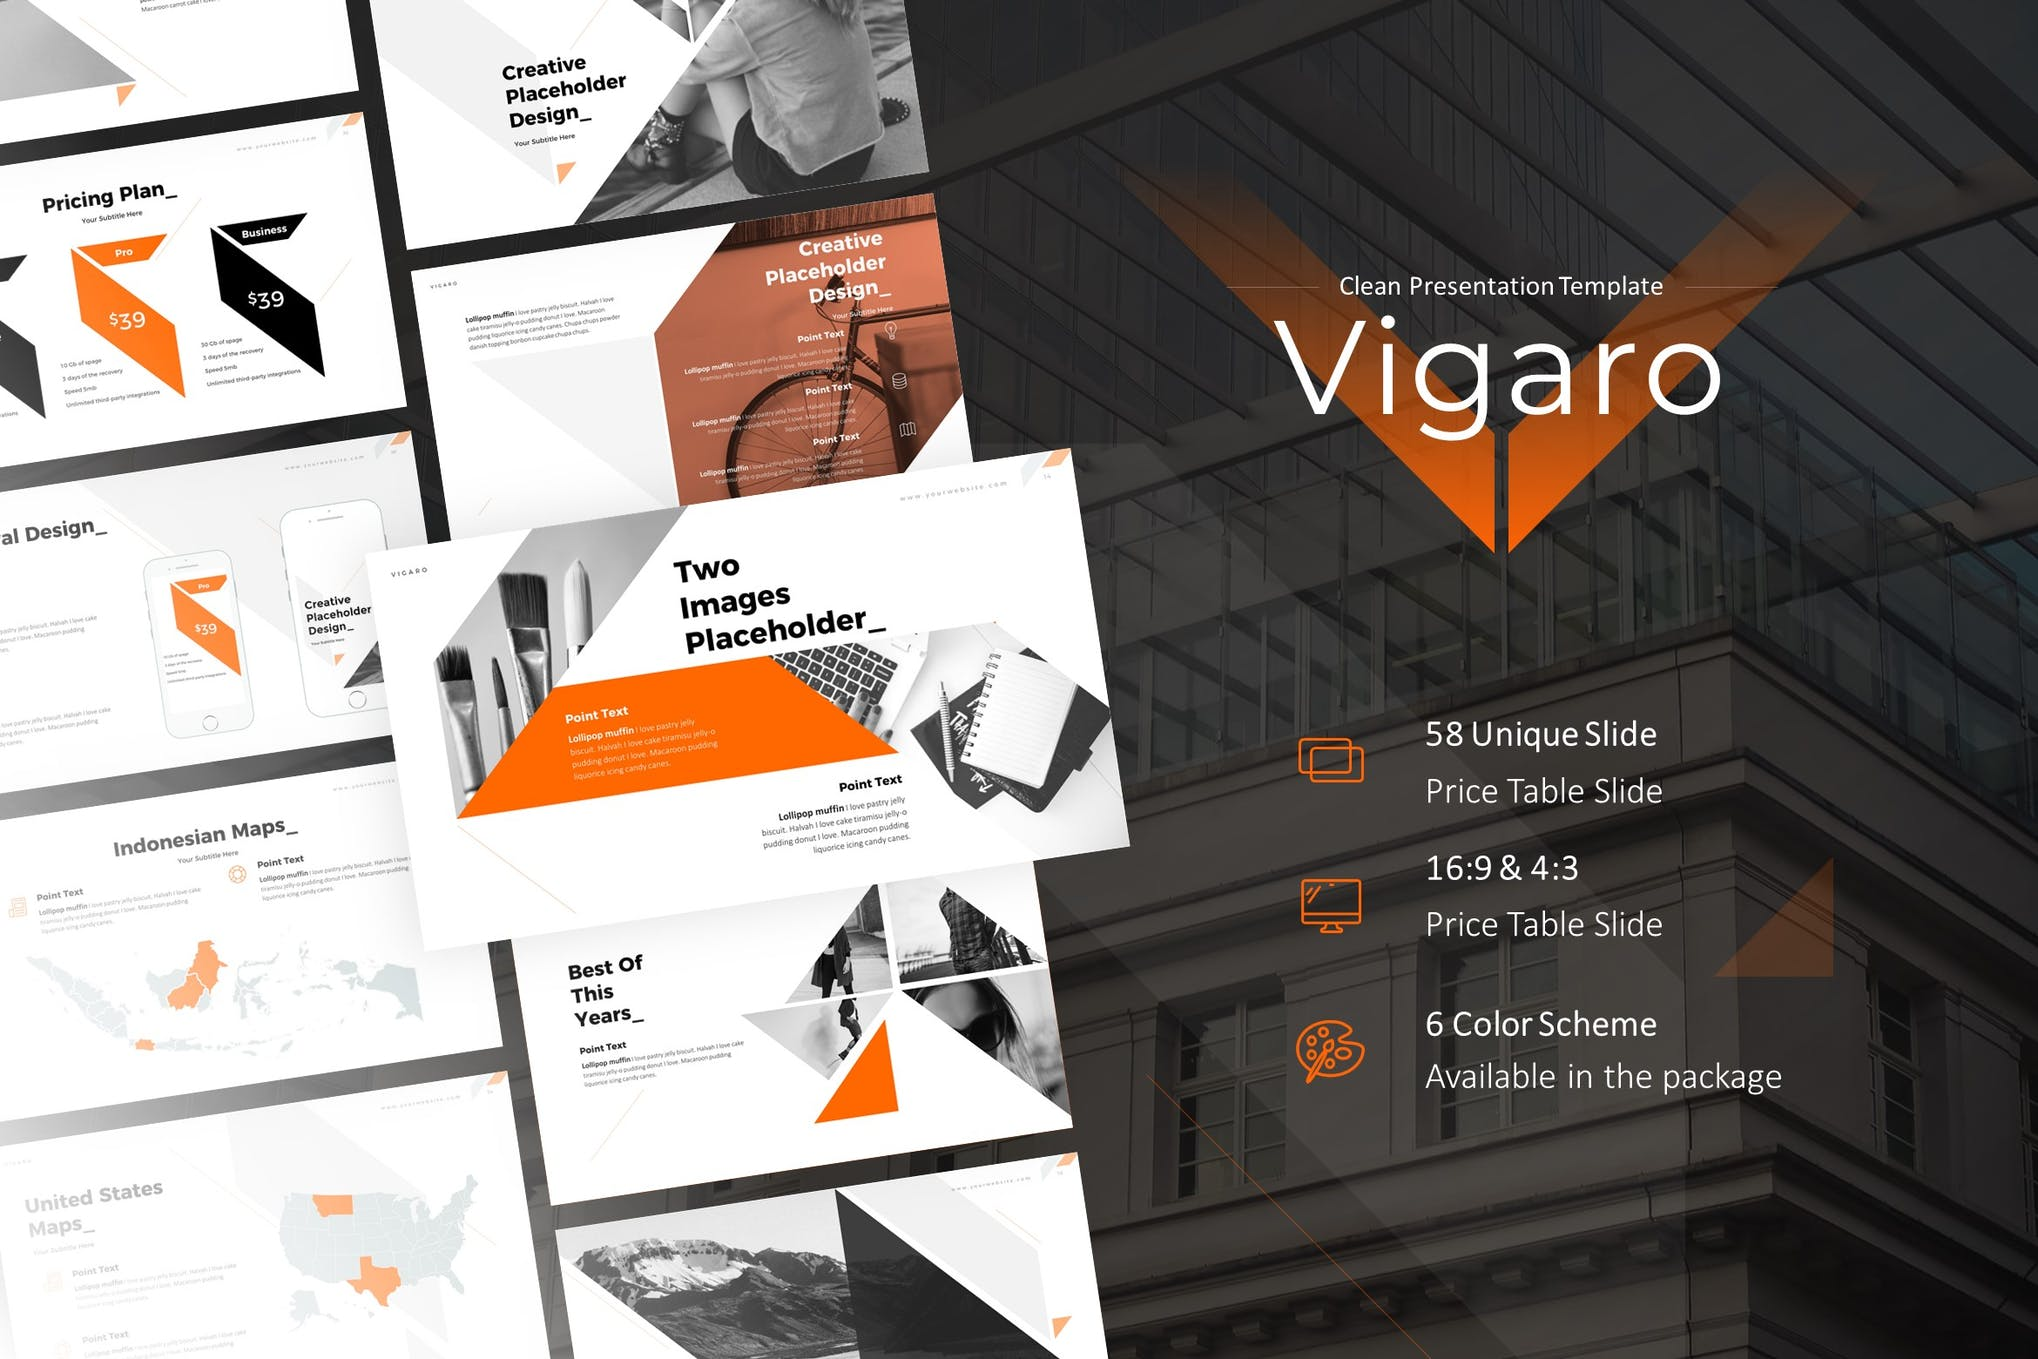 Vigaro PowerPoint Presentation Template